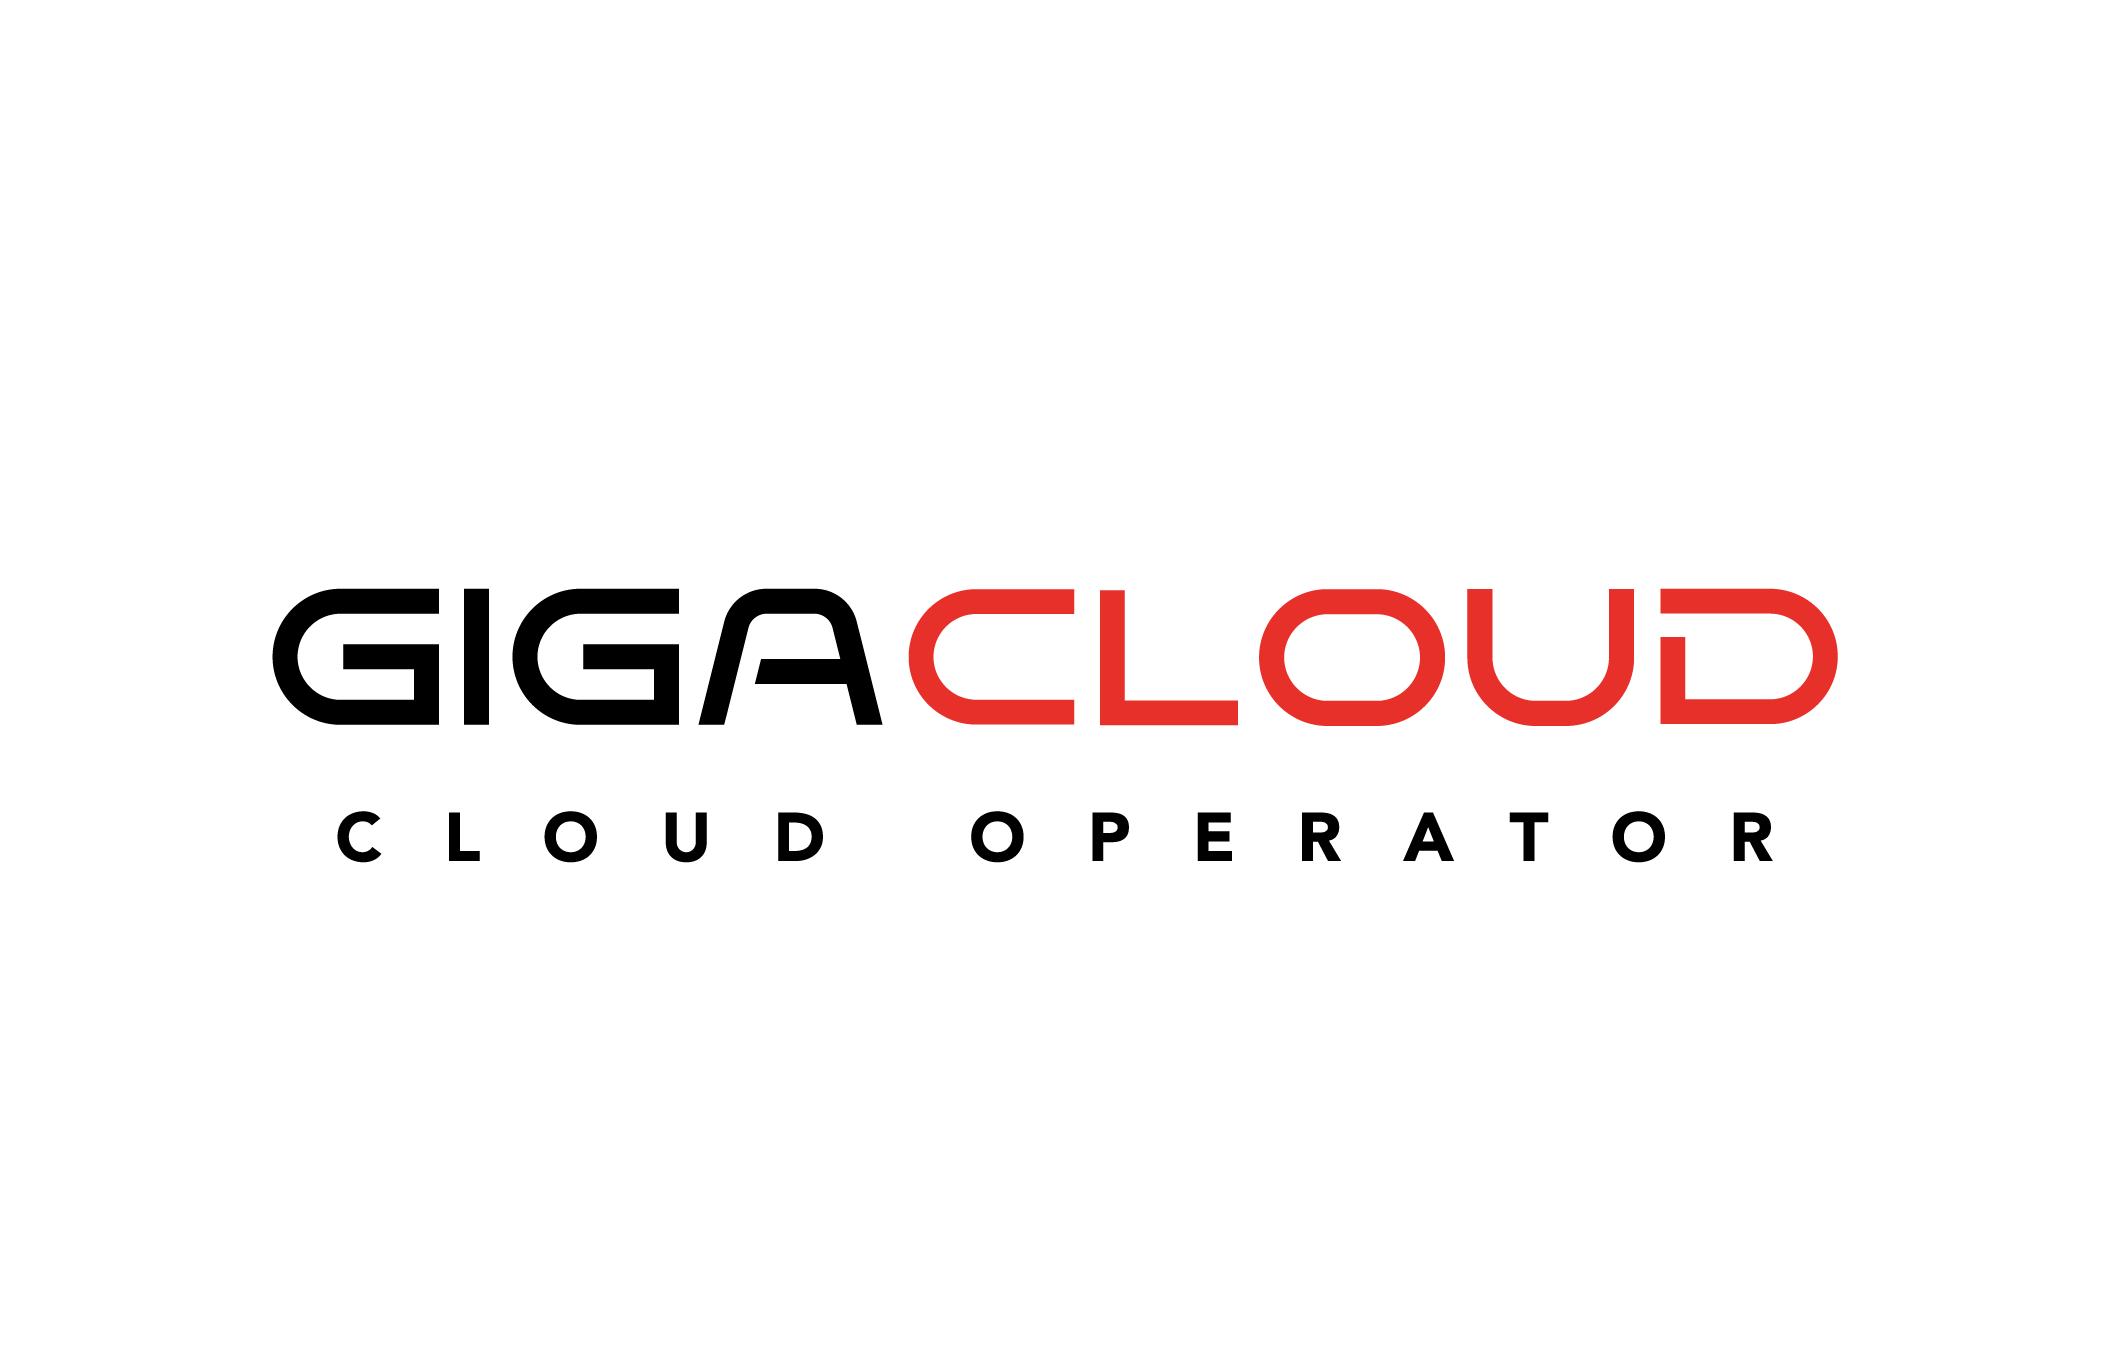 gigacloud logo | гігаклауд лого | netgroup